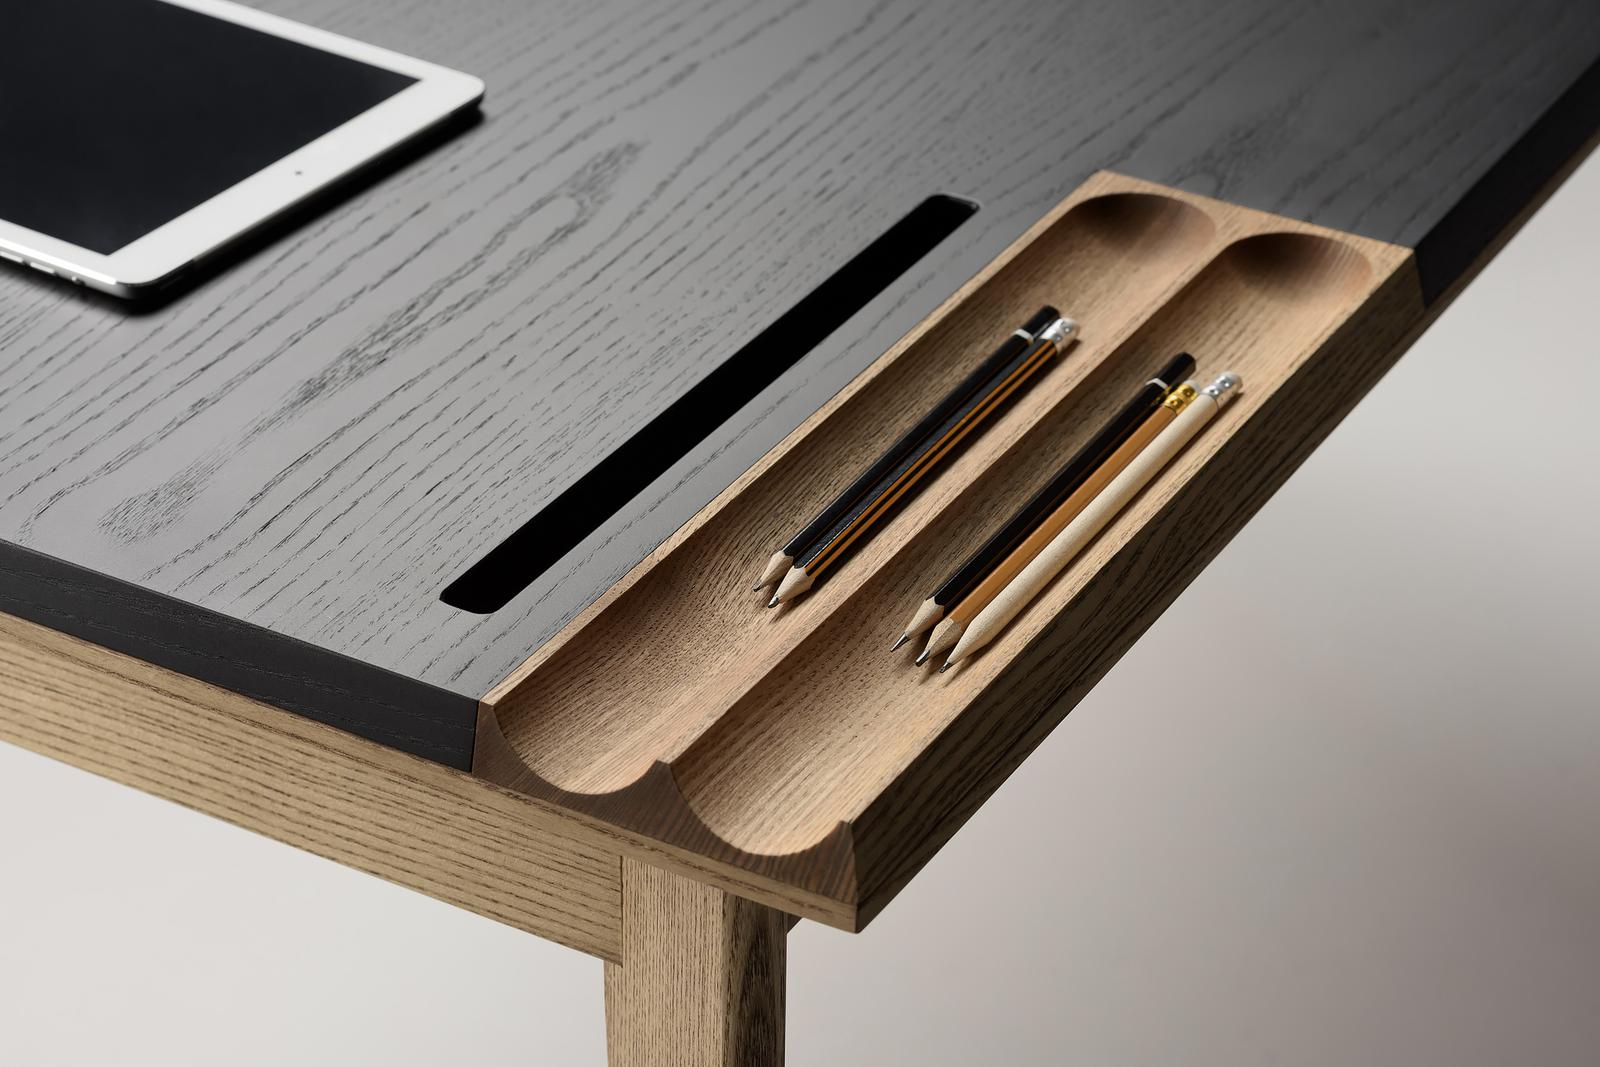 OLLLY - Desk